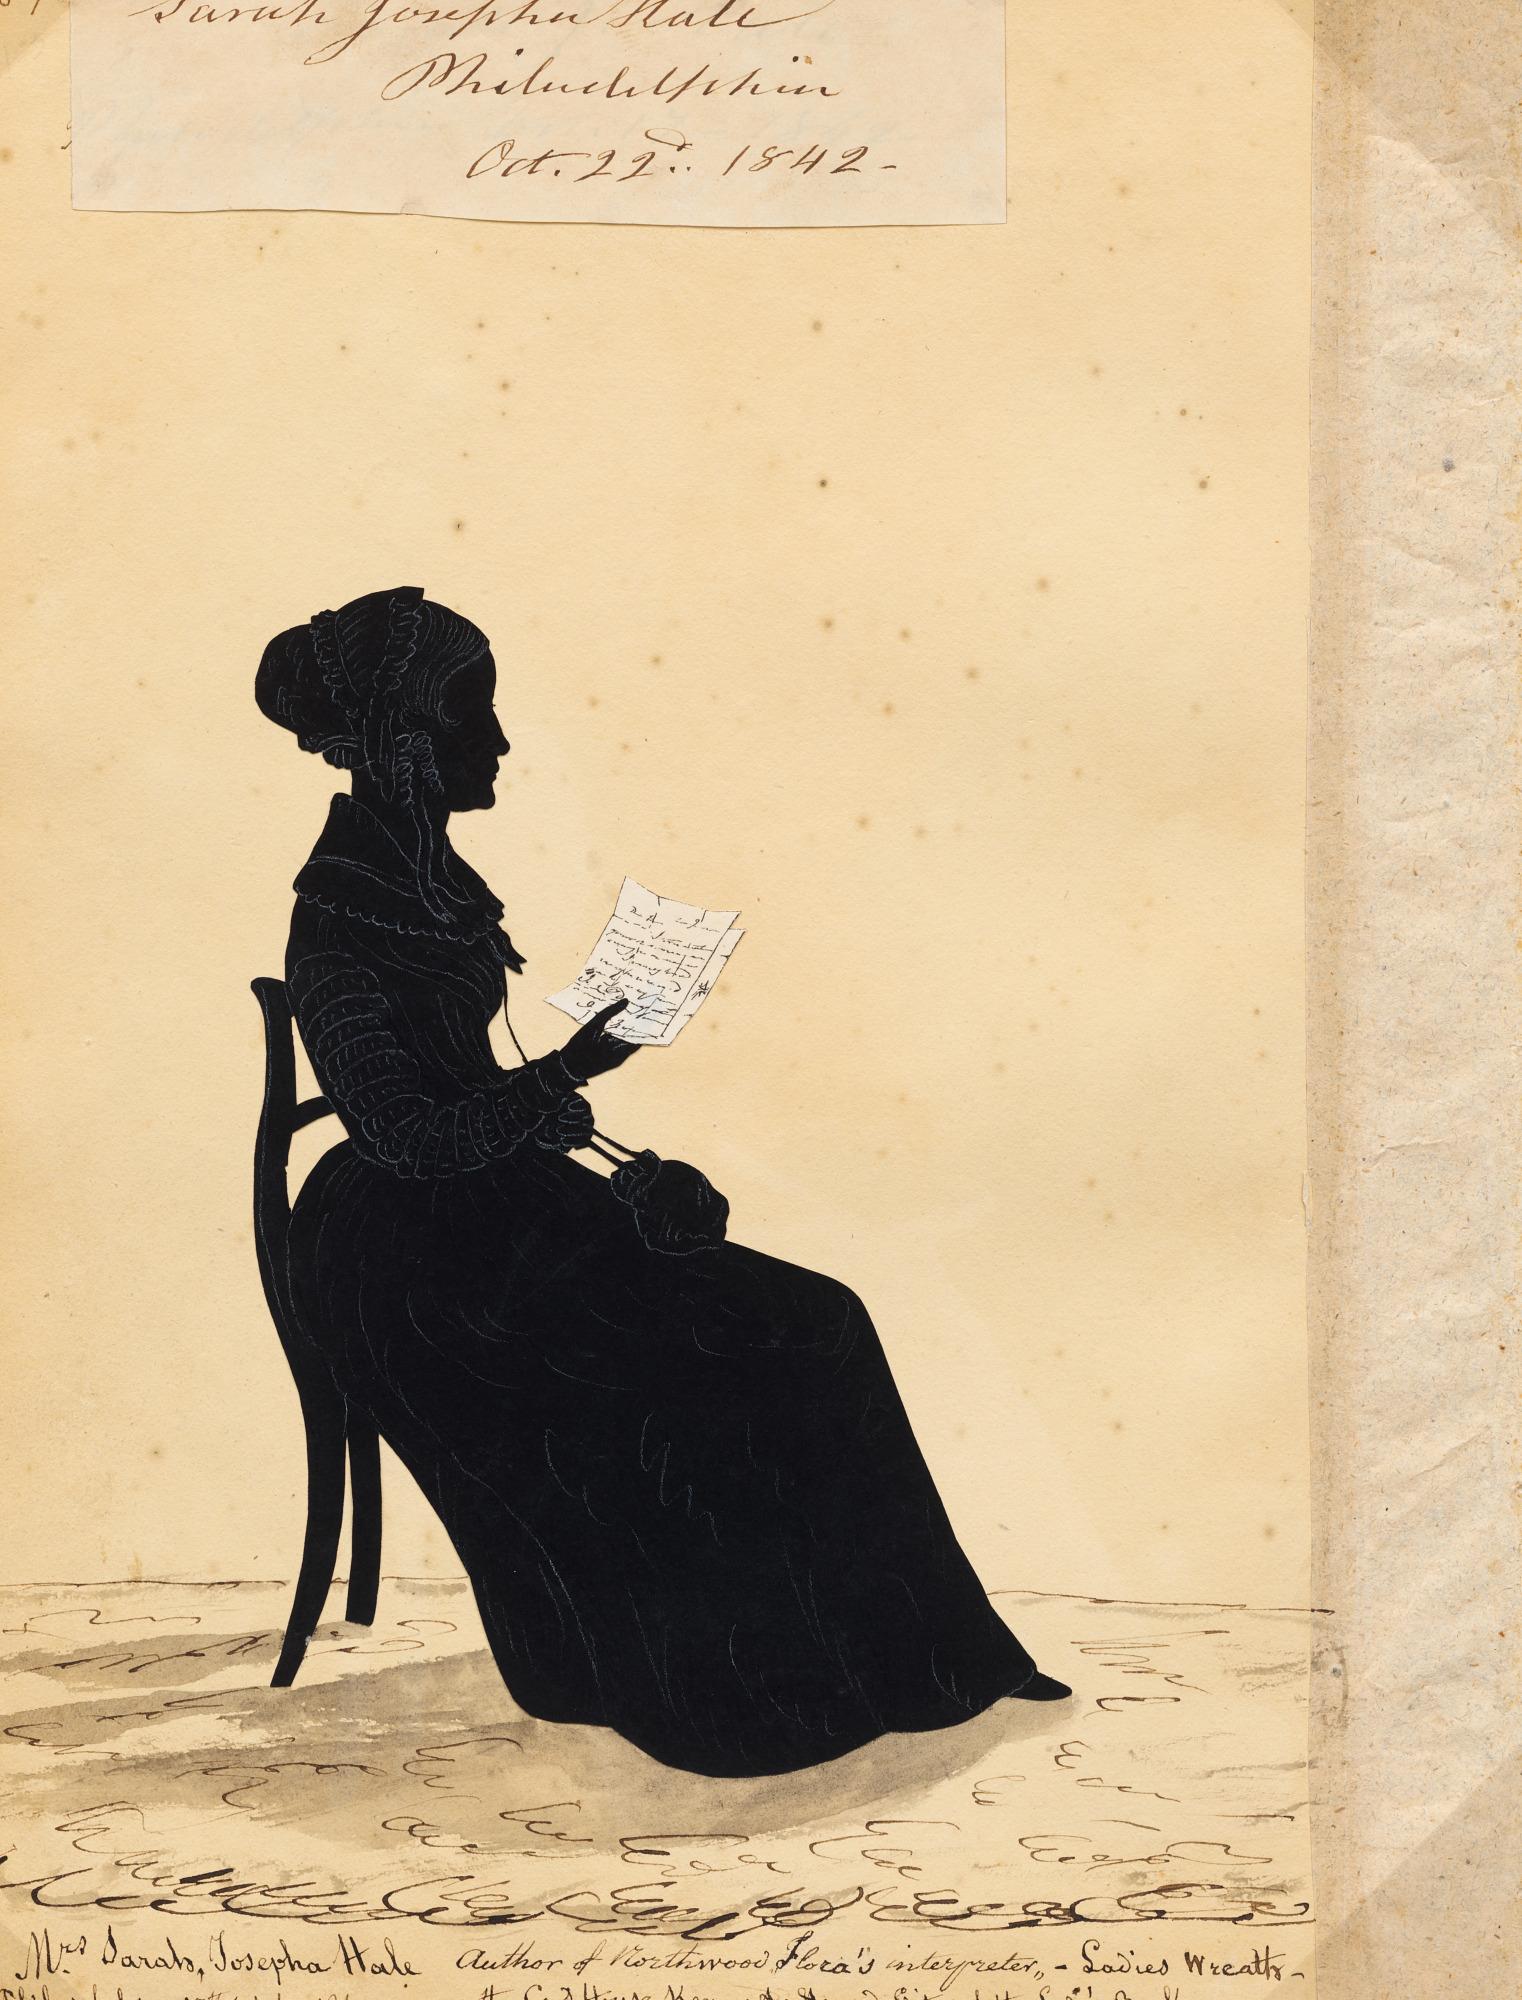 Sarah Josepha Buell Hale